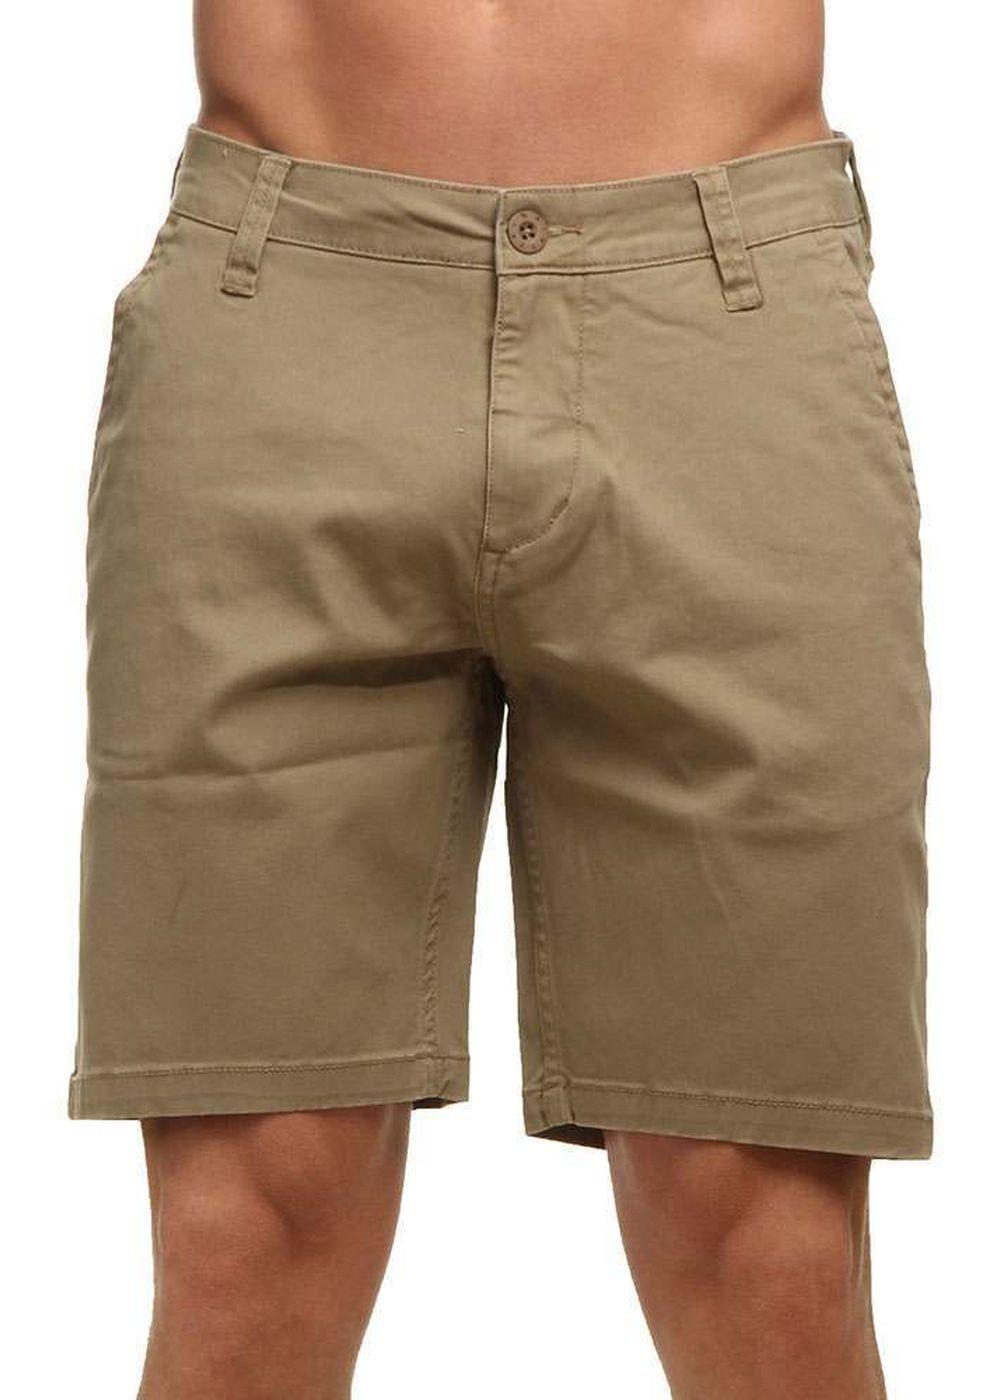 ripcurl-all-day-shorts-lead-grey